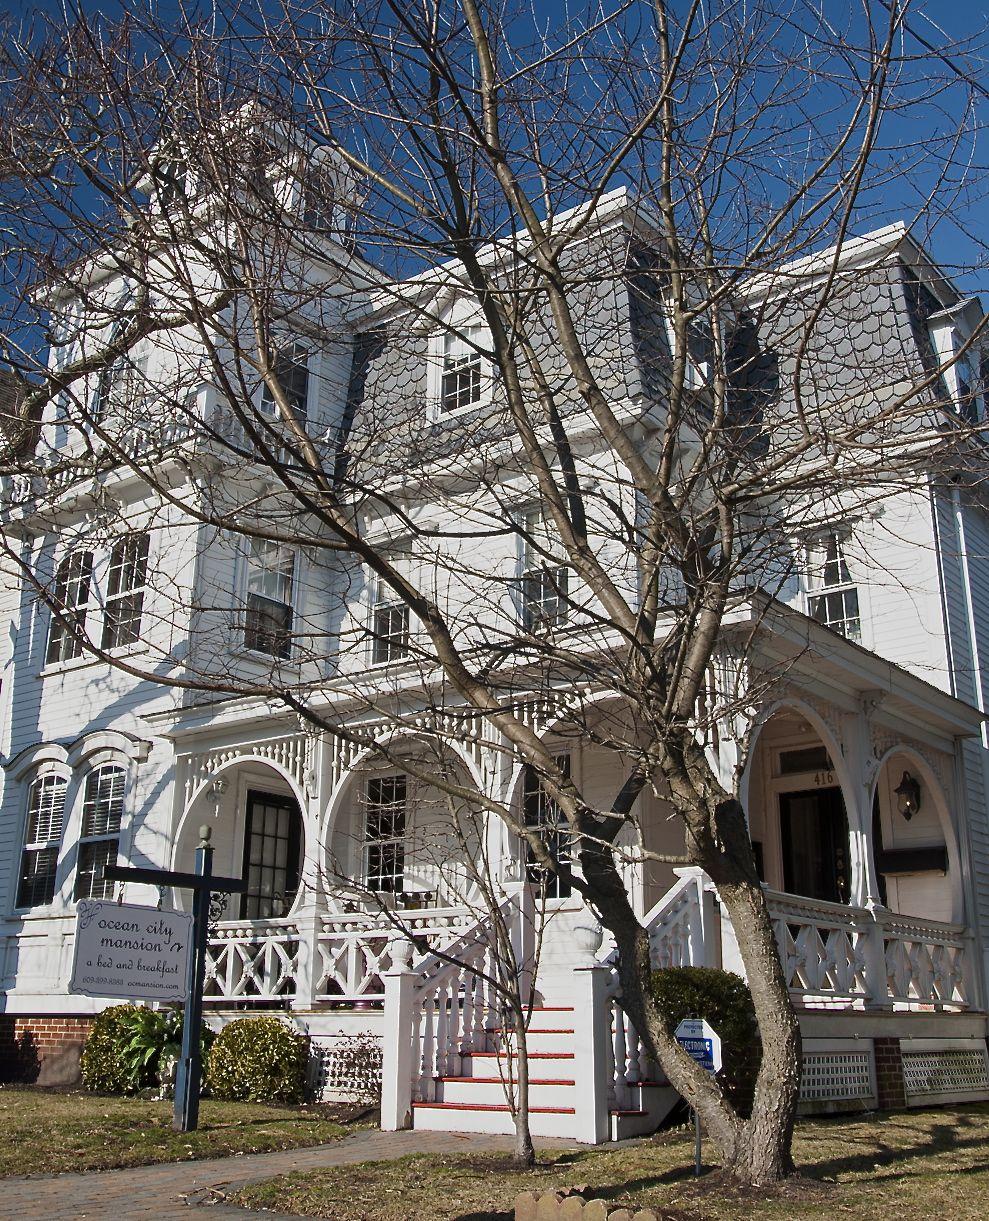 Haunted House York University: Ocean City, NJ Hospitality Association